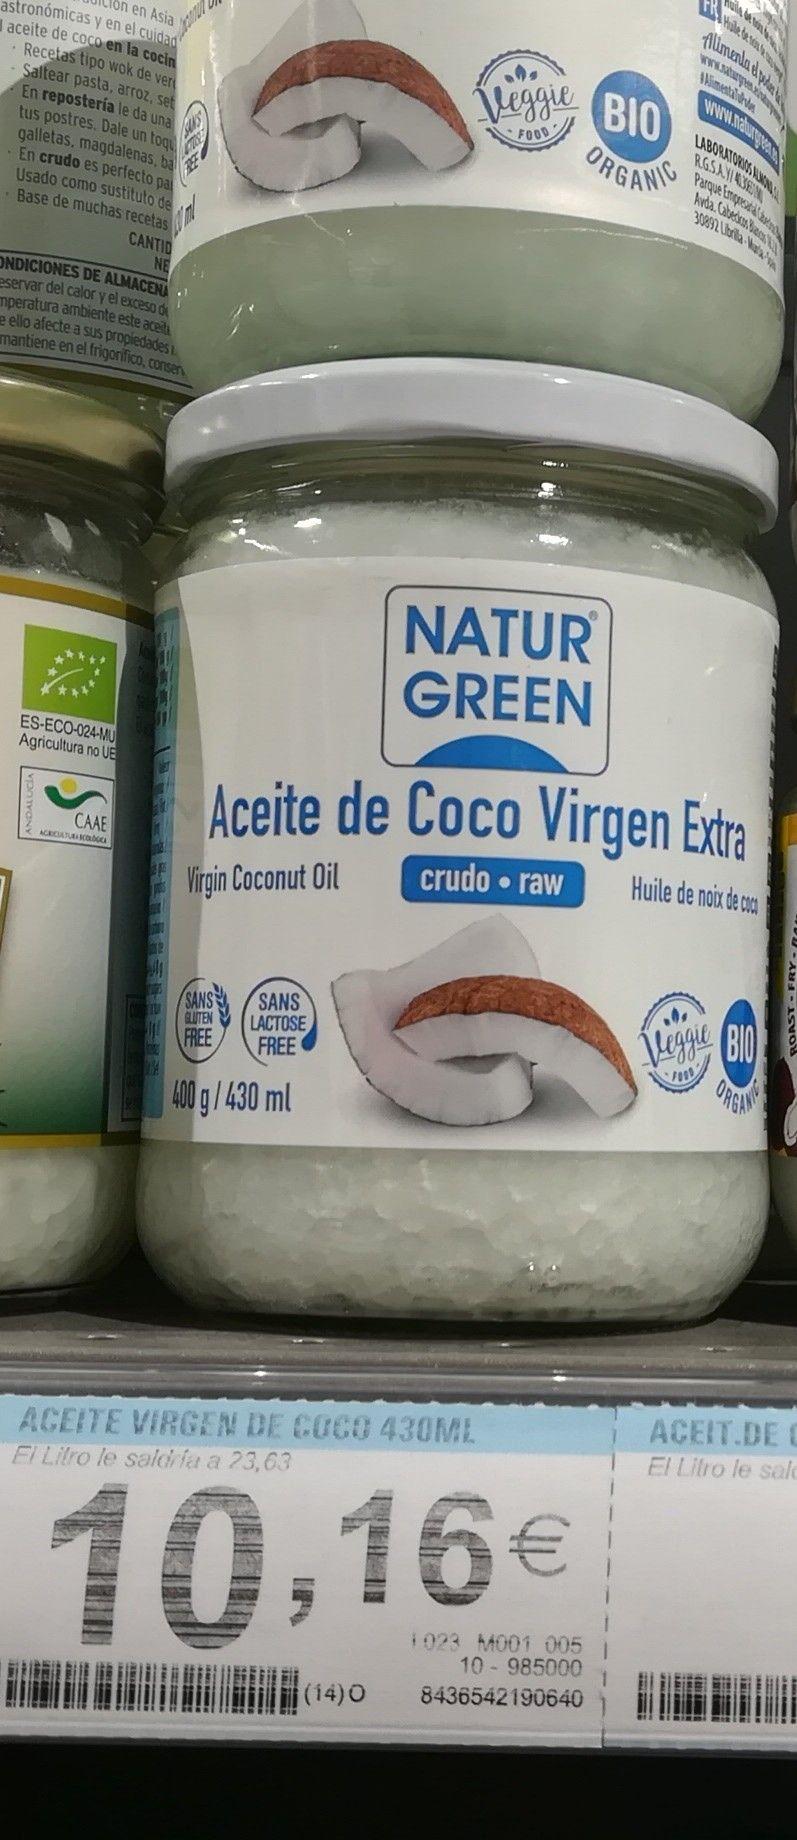 Aceite Virgen De Coco Natur Green 23 63 Kg Carrefour Aceite De Coco